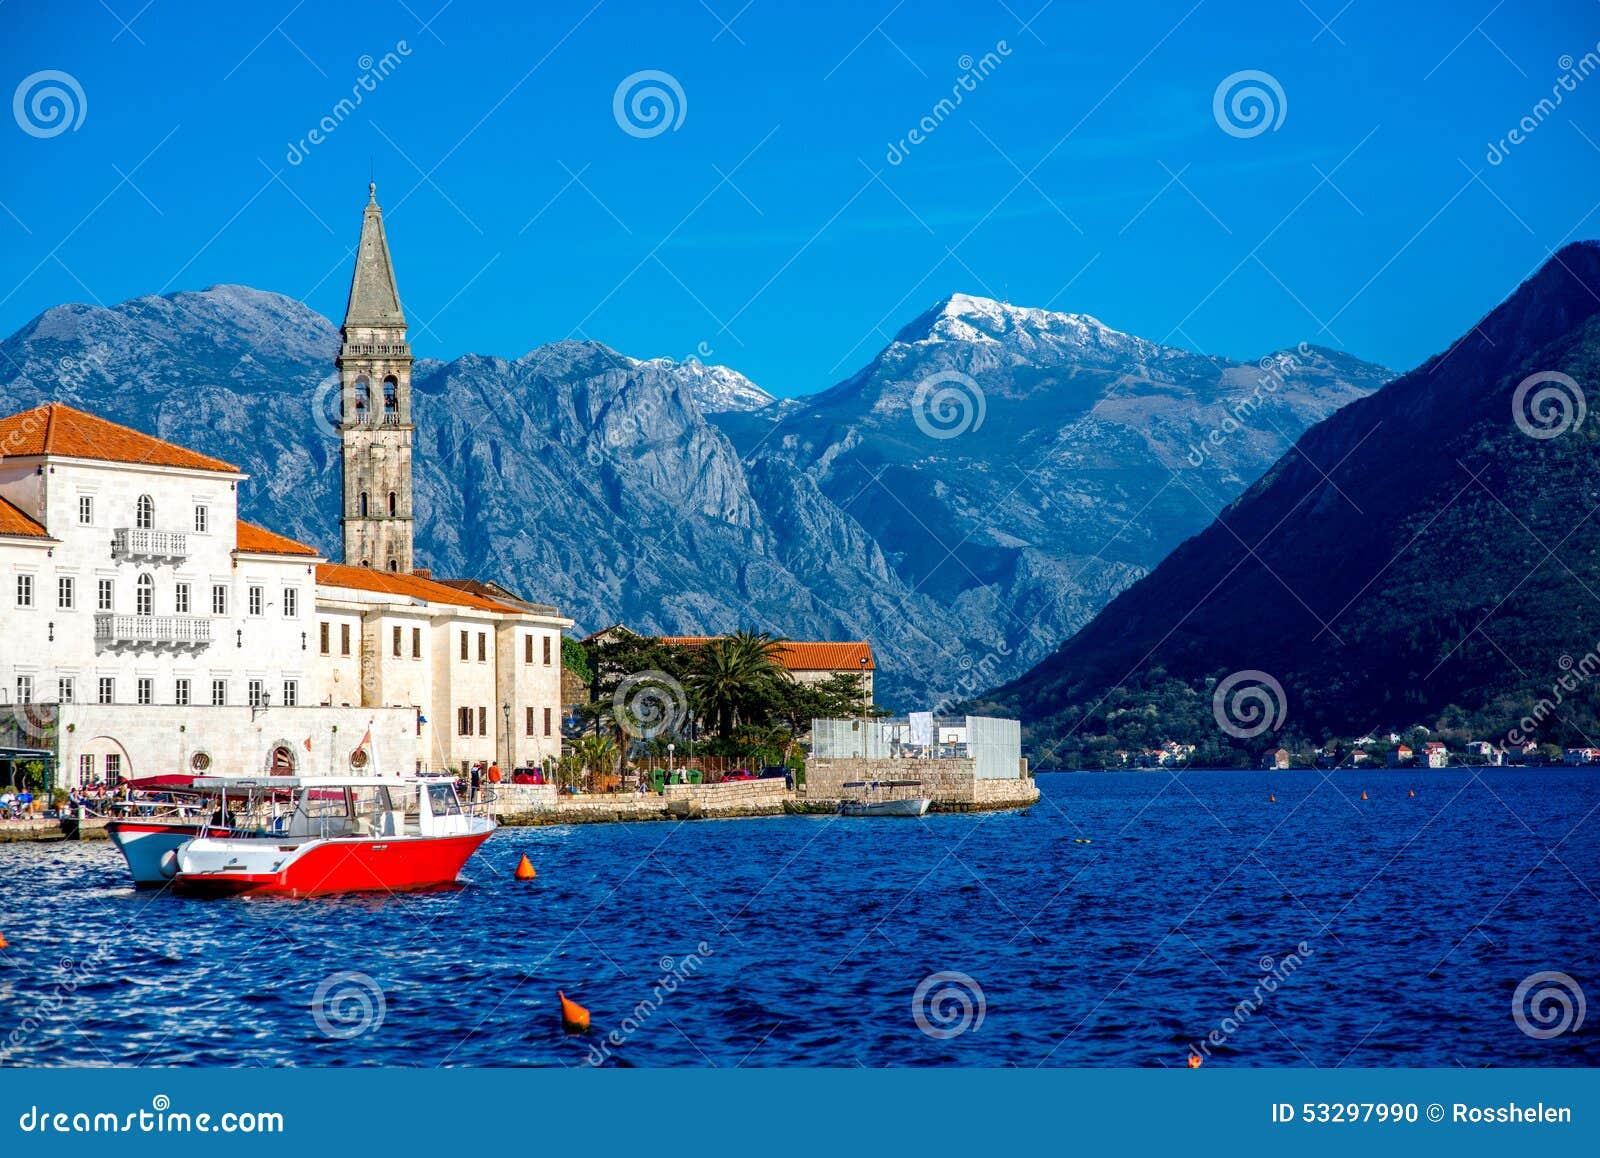 Perast city in Kotor bay